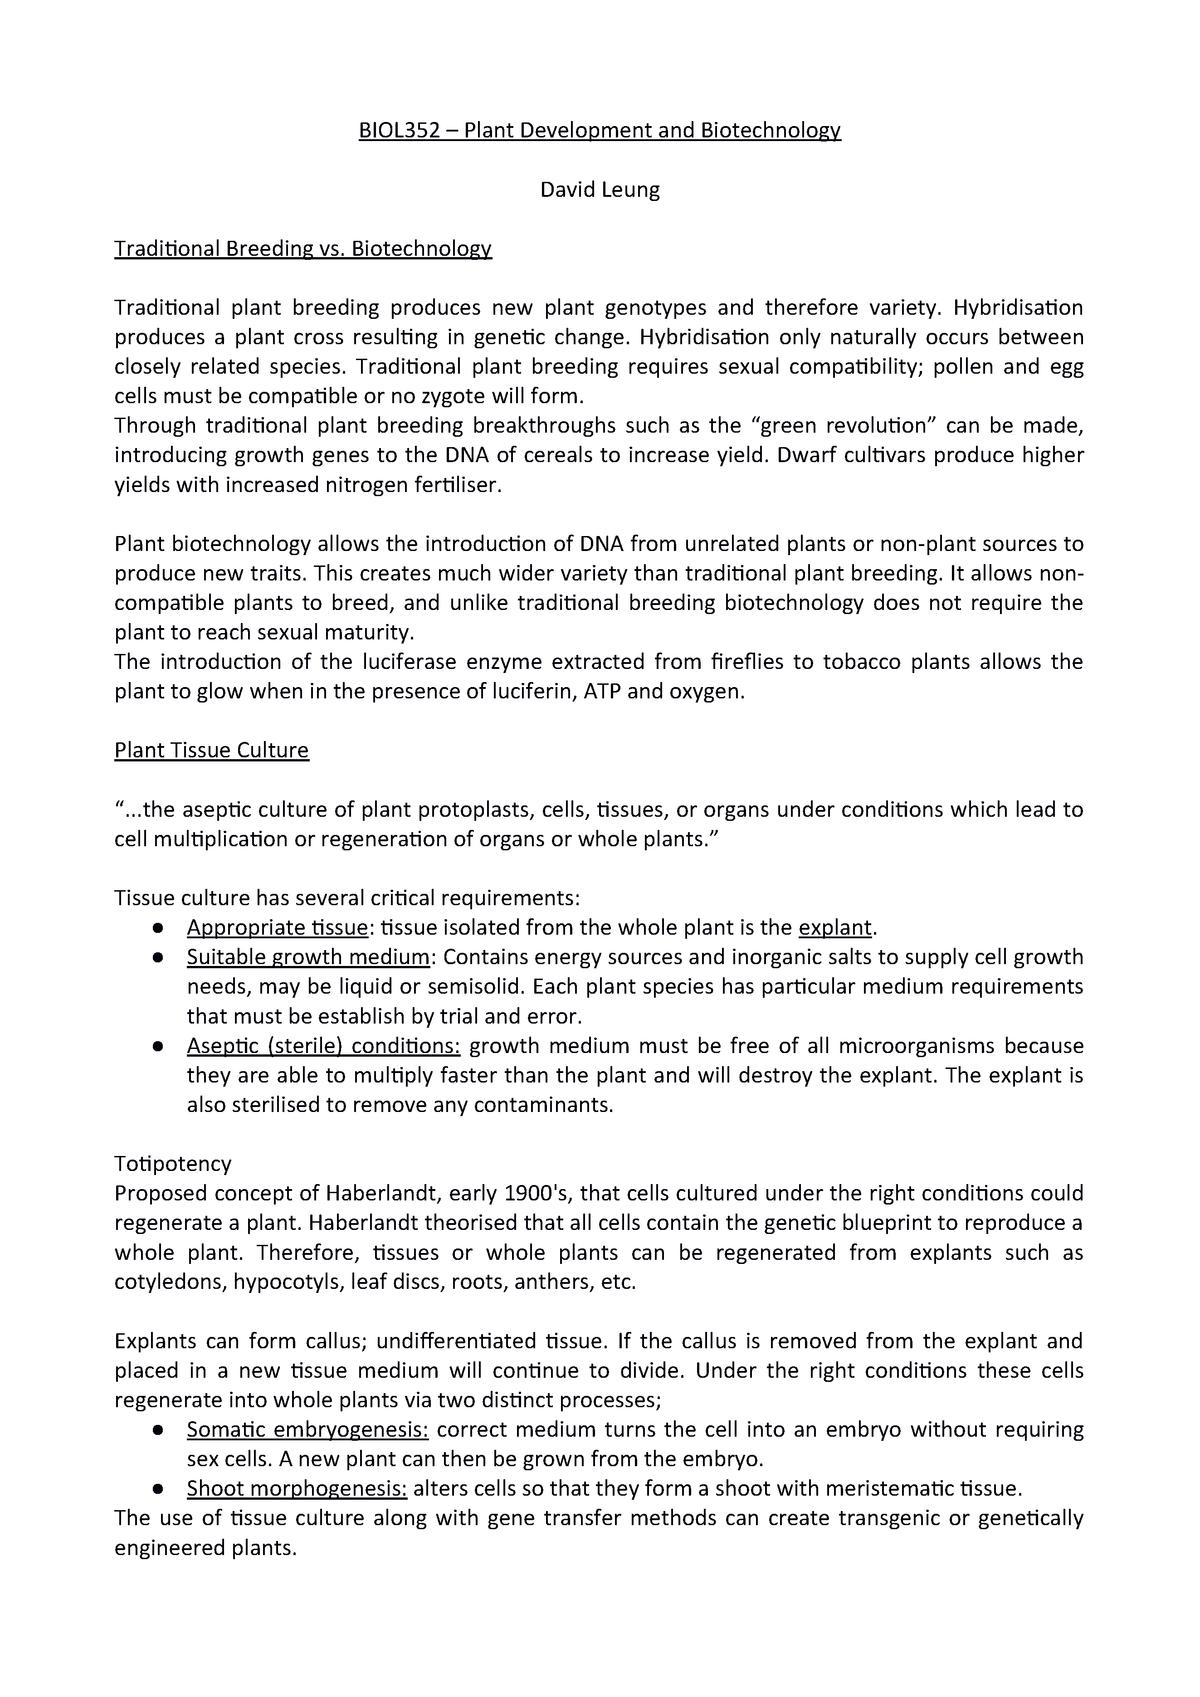 David Leung lectures - lecture notes - BIOL352: Plant Development